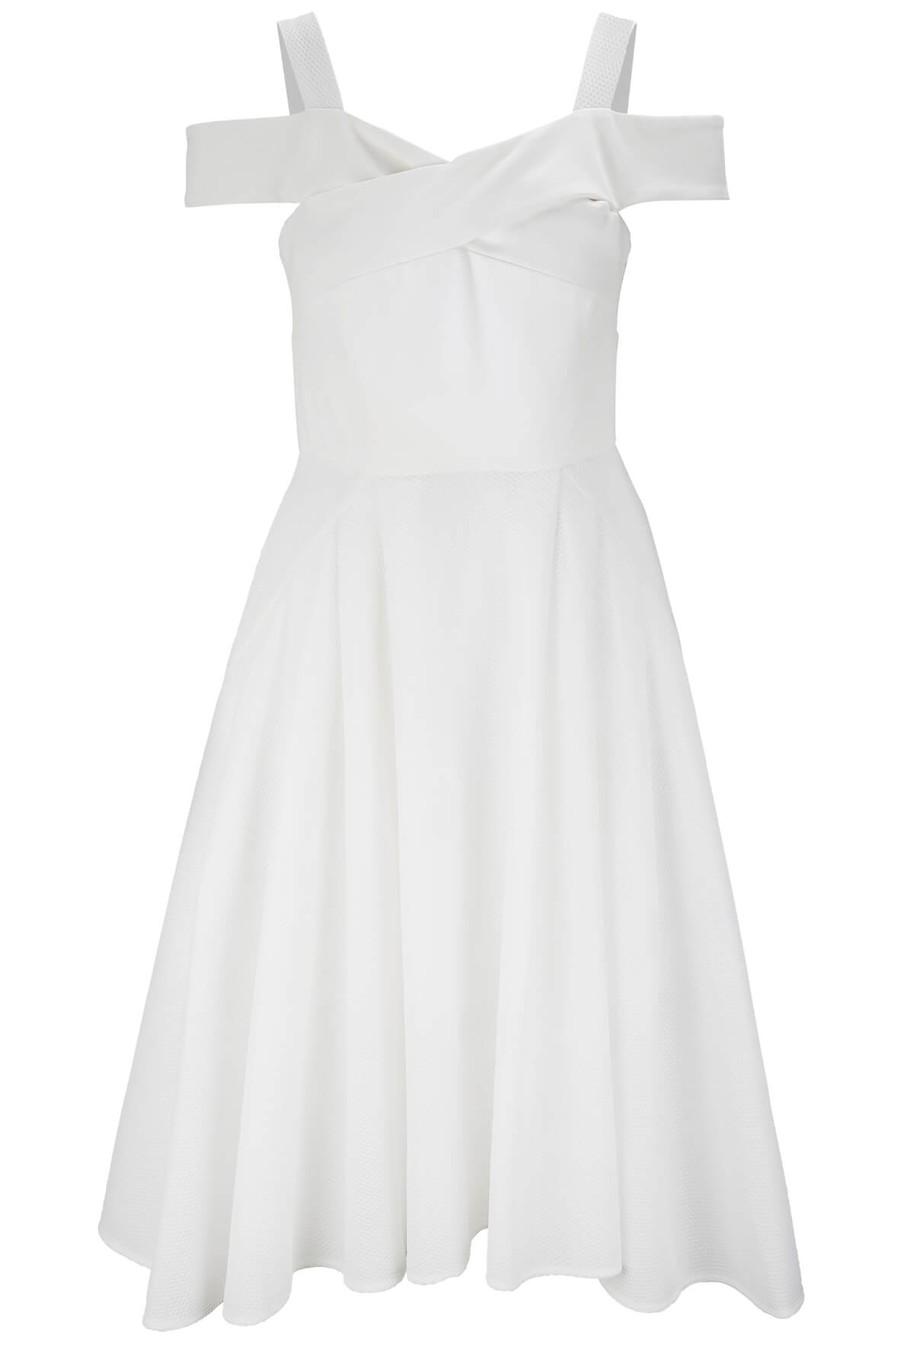 Style Theory_elliatt-verve-dress-white-1